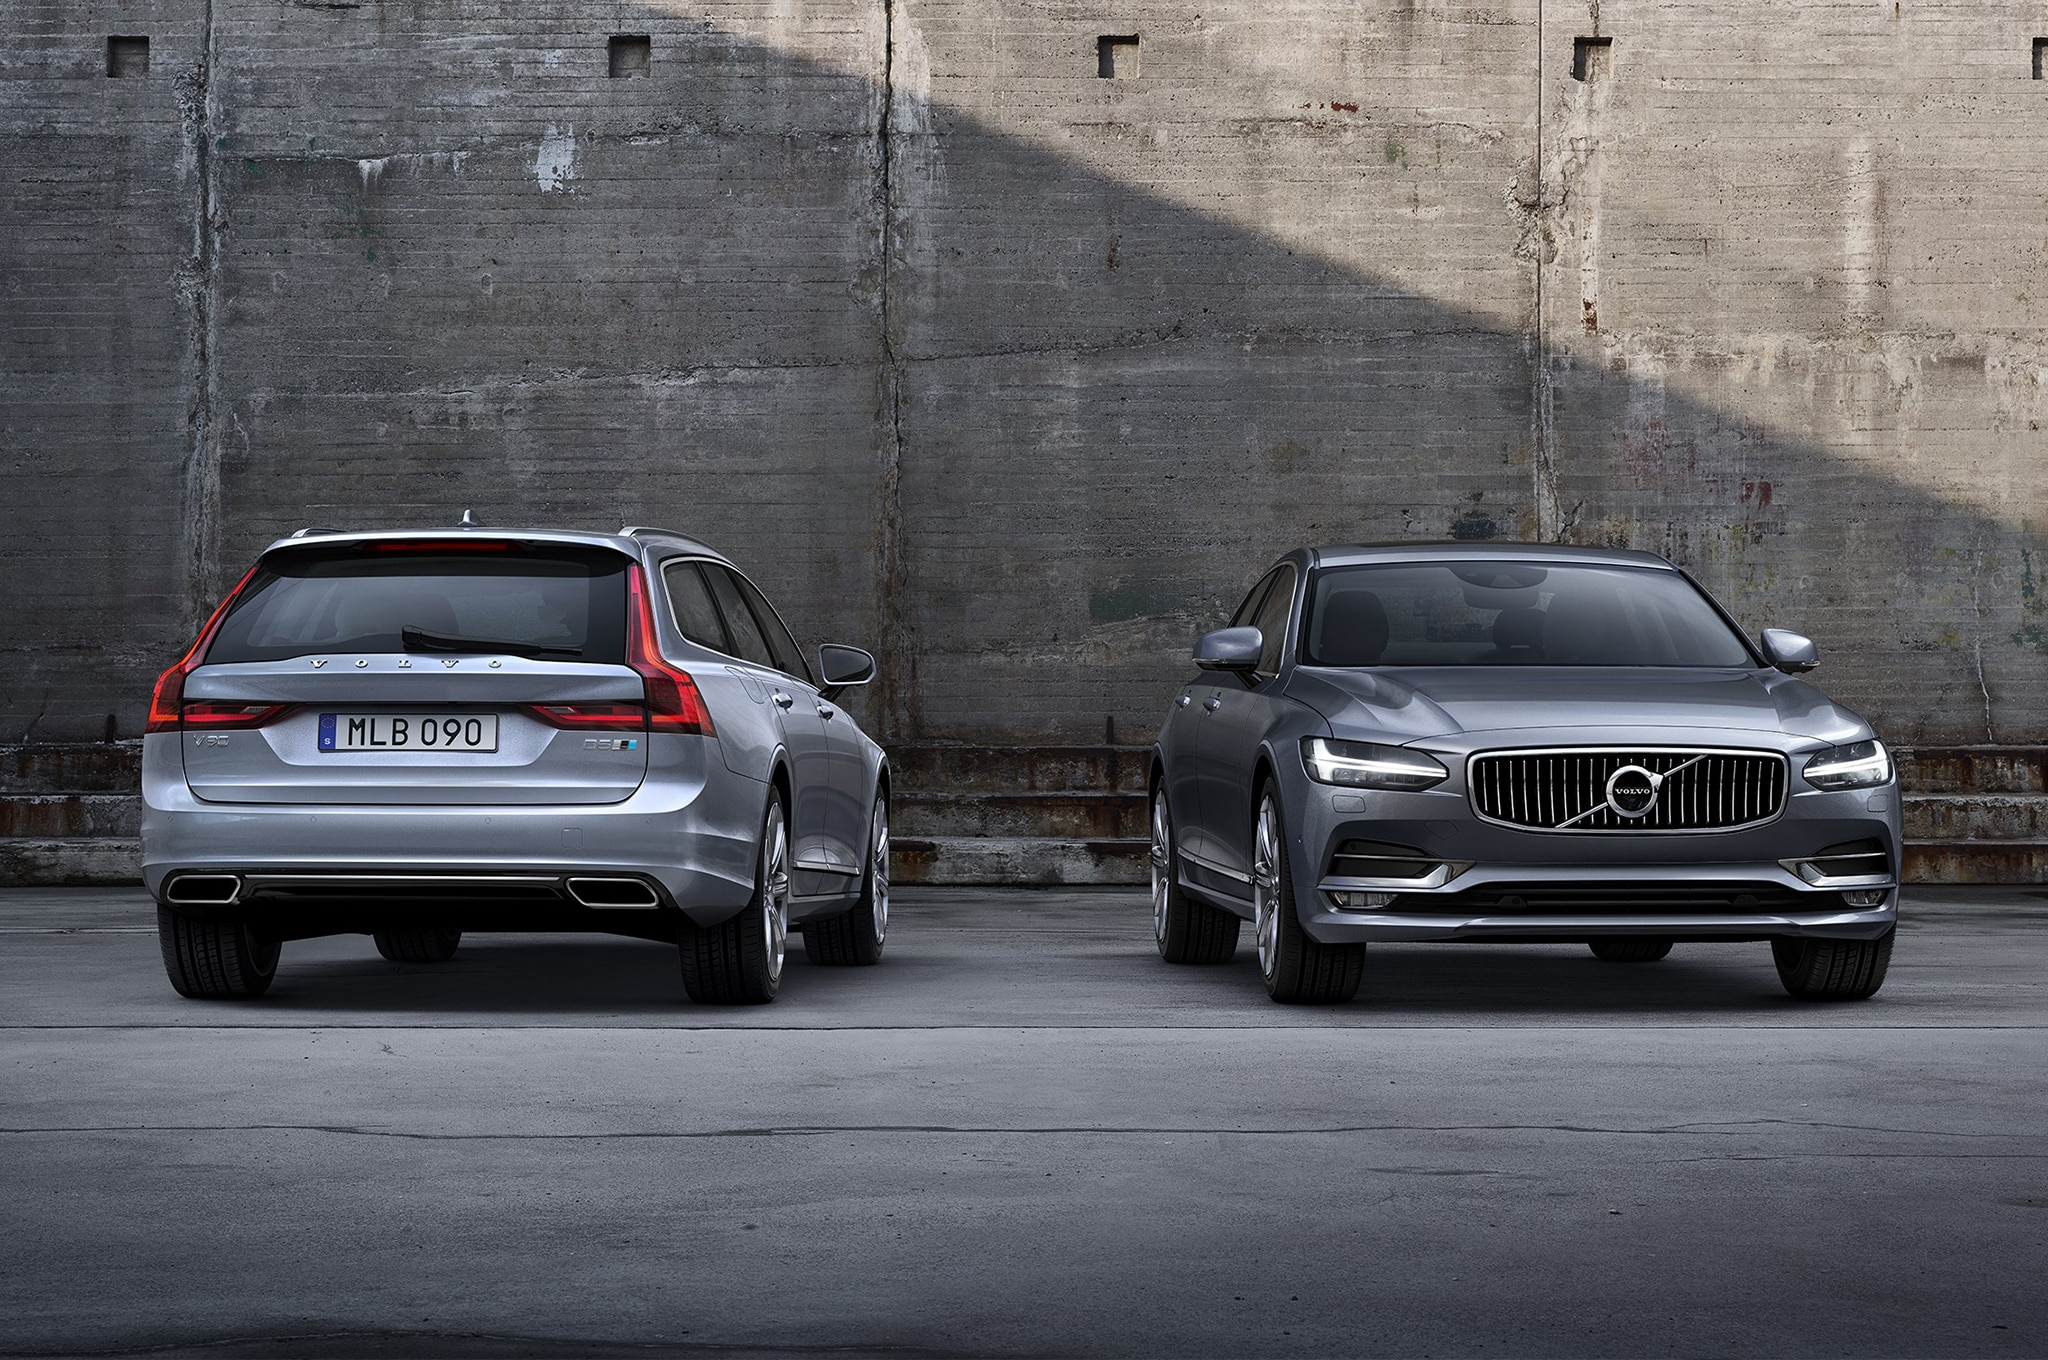 Excellent 2017 Volvo S90 Luxury Sedan Fully Revealed With XC90